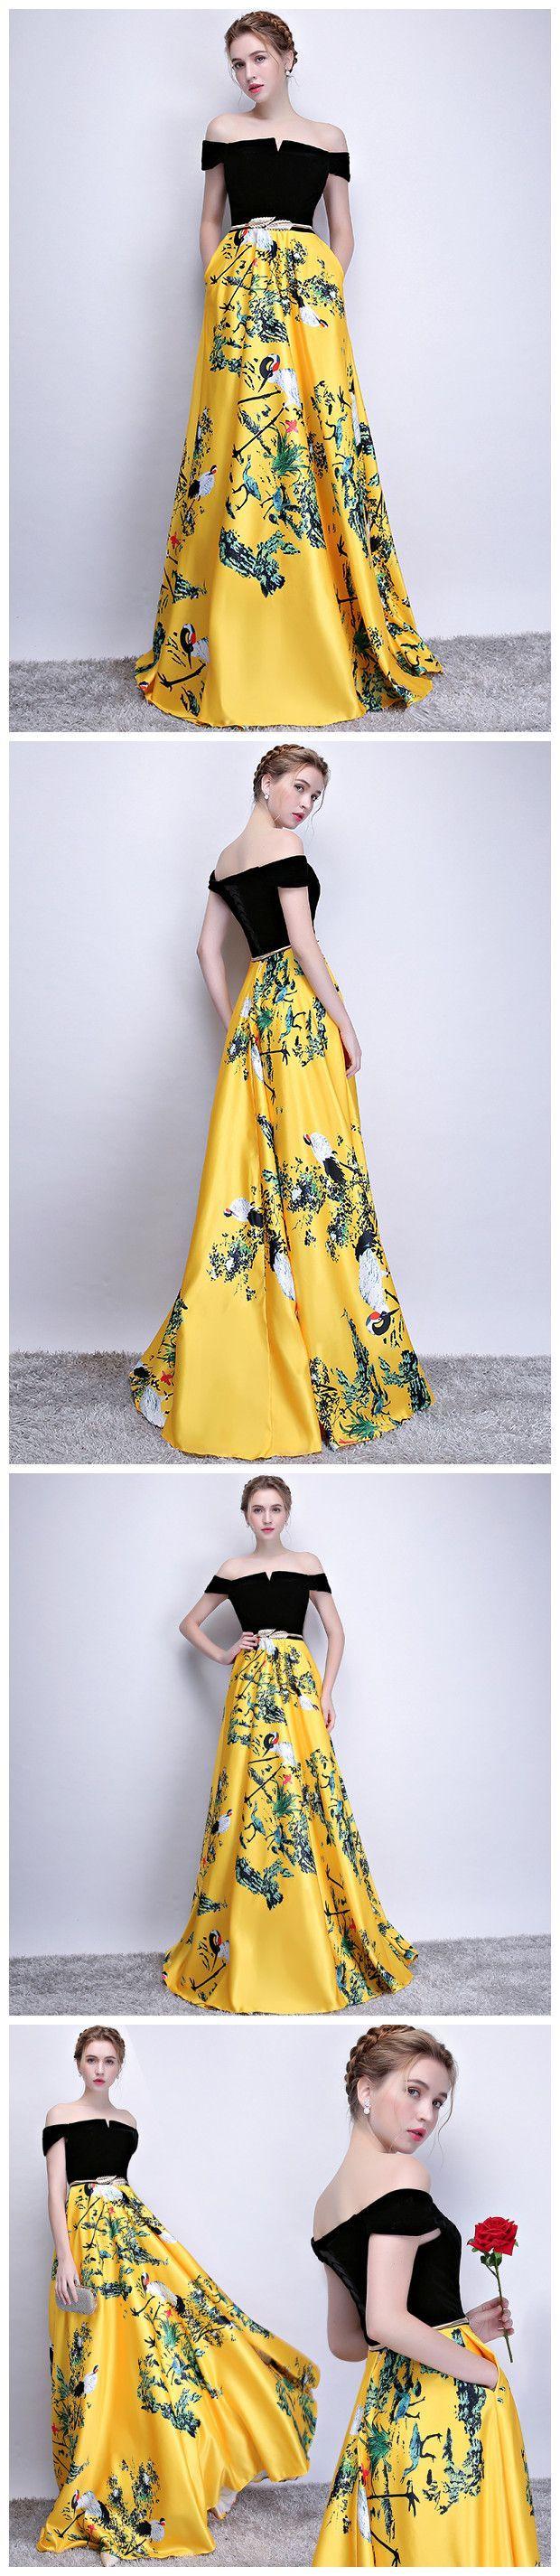 Offtheshoulder prom dress aline yesllow floral satin long prom